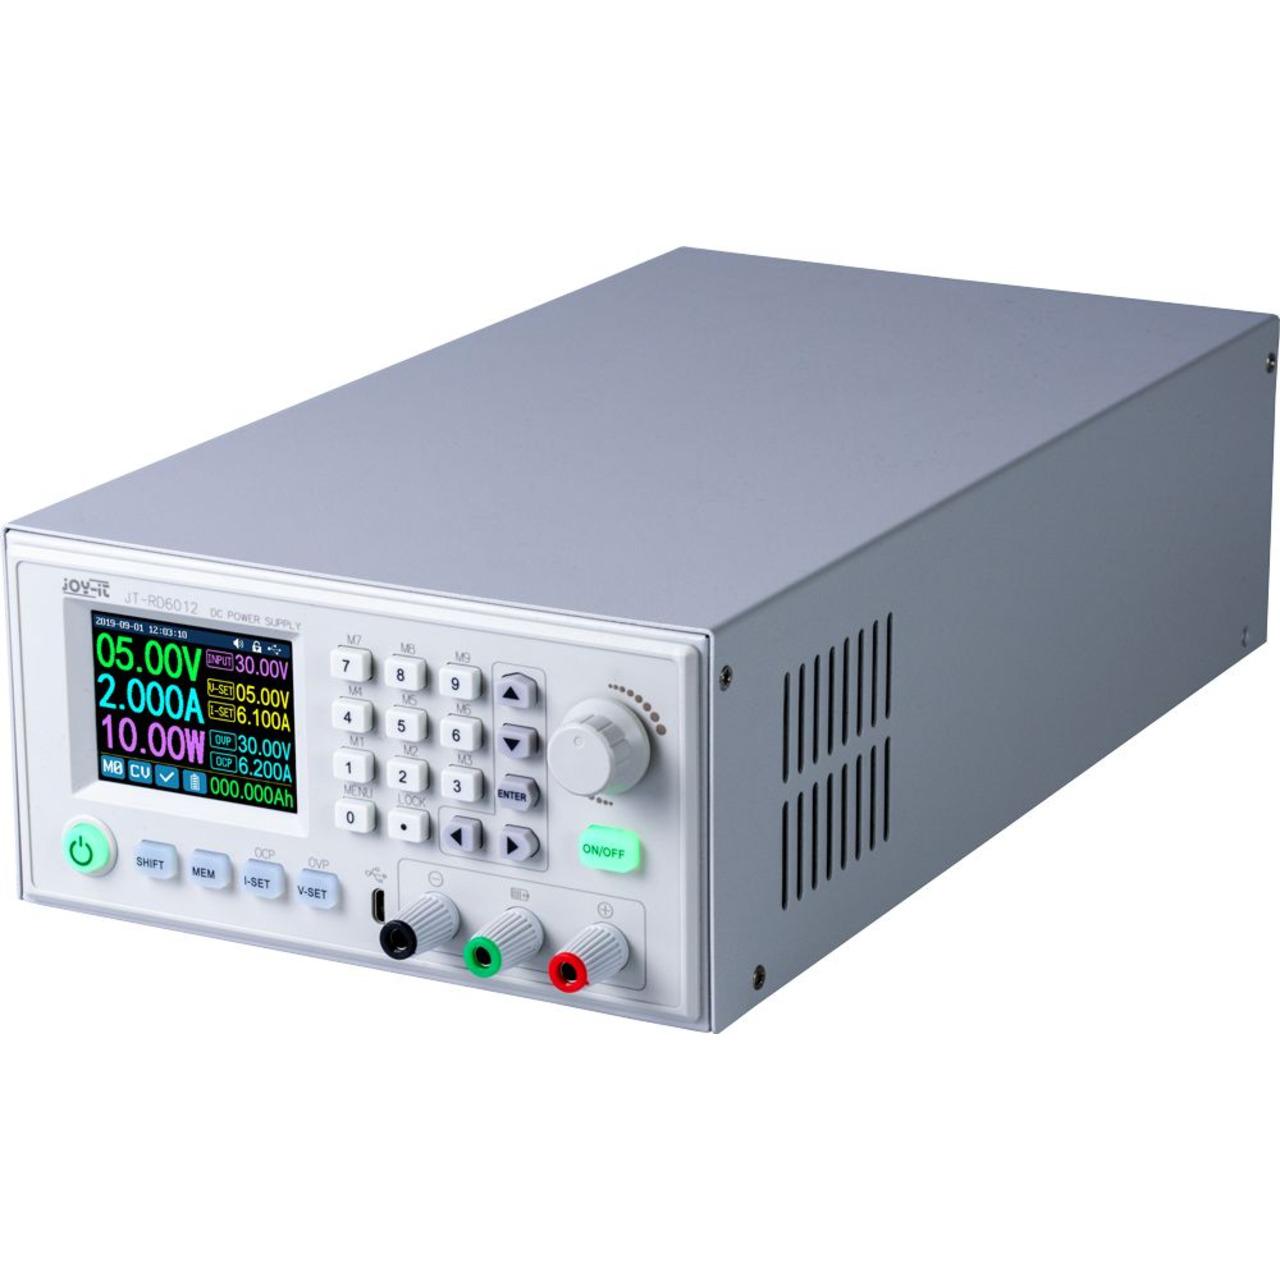 Joy-IT Programmierbares Labornetzteil JT-RD6012 Komplettgerät- 0-60 V/0-12 A- max. 720 W